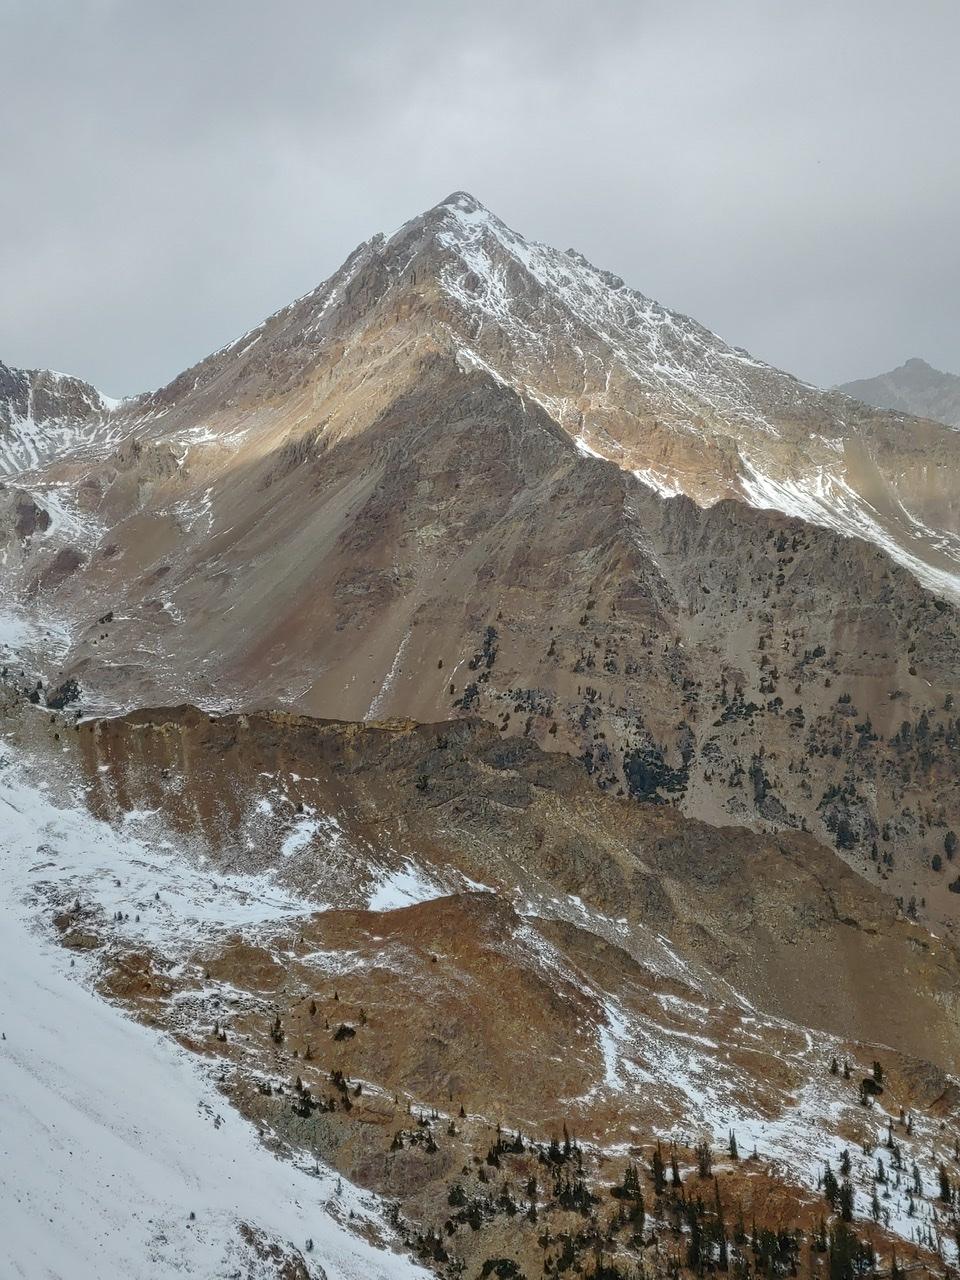 Glassford Peak from Peak 10446. Brett Sergenian Photo